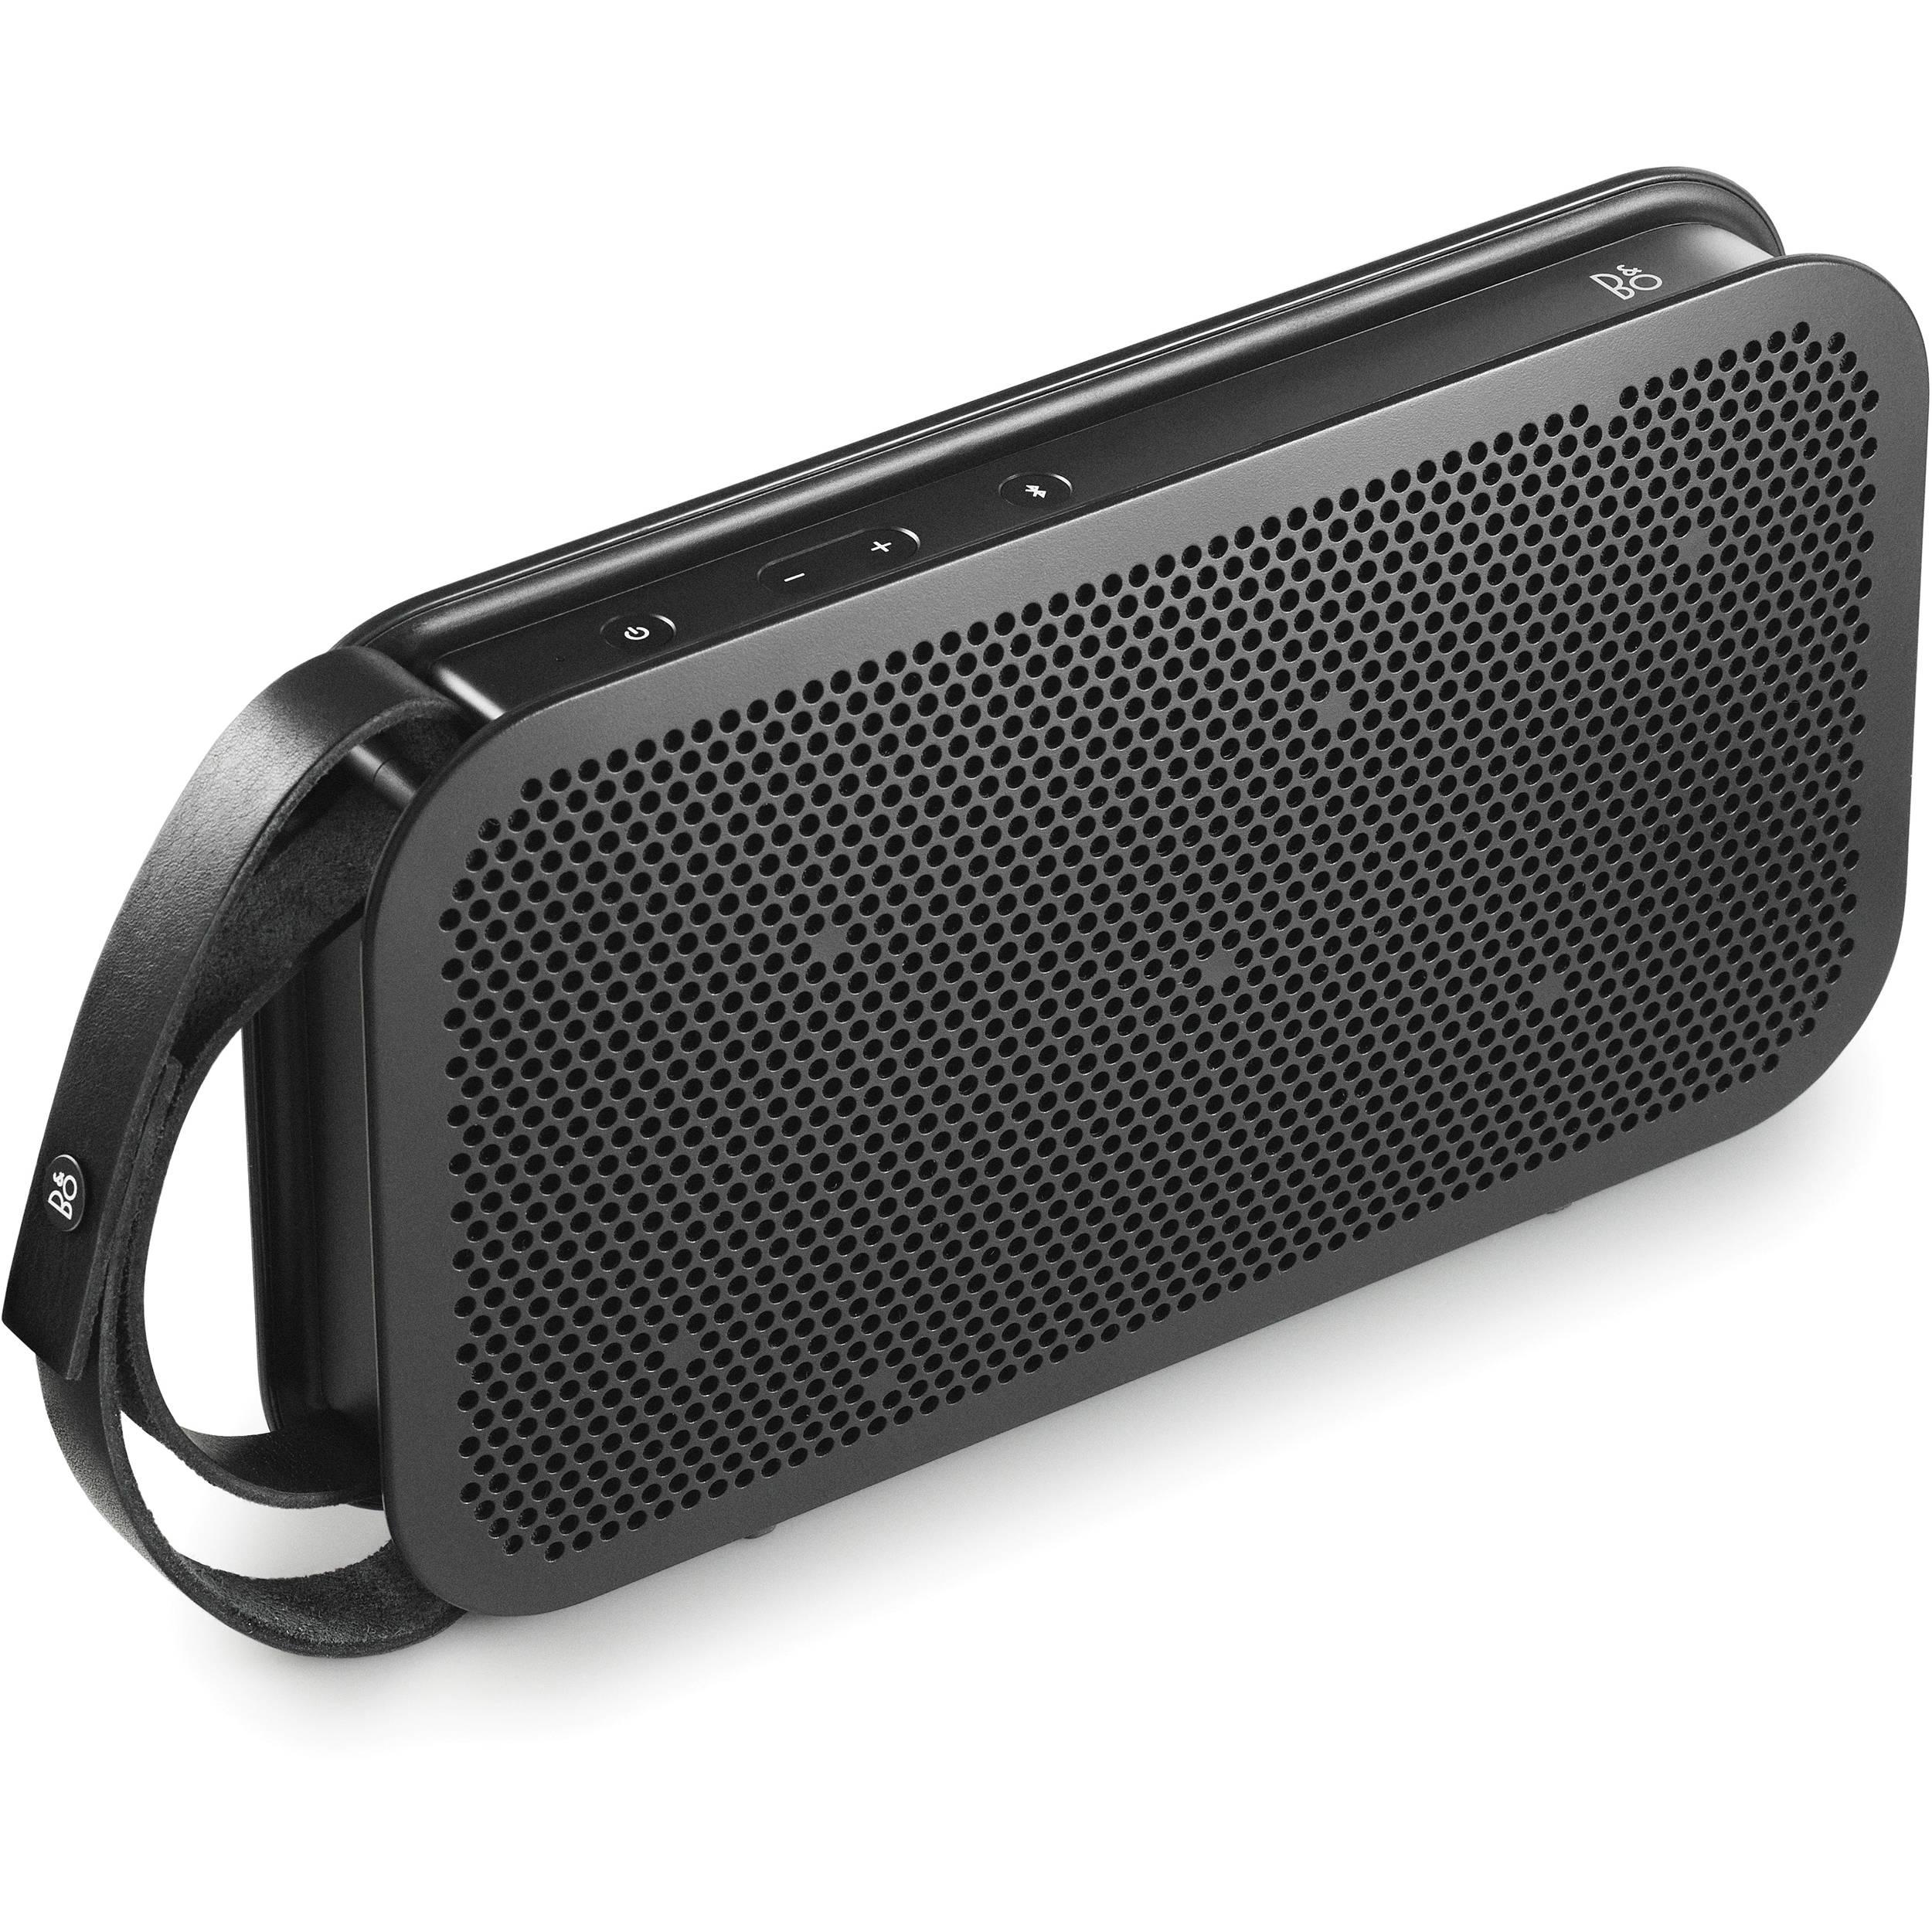 b o play b o play a2 bluetooth speaker black 1290937. Black Bedroom Furniture Sets. Home Design Ideas